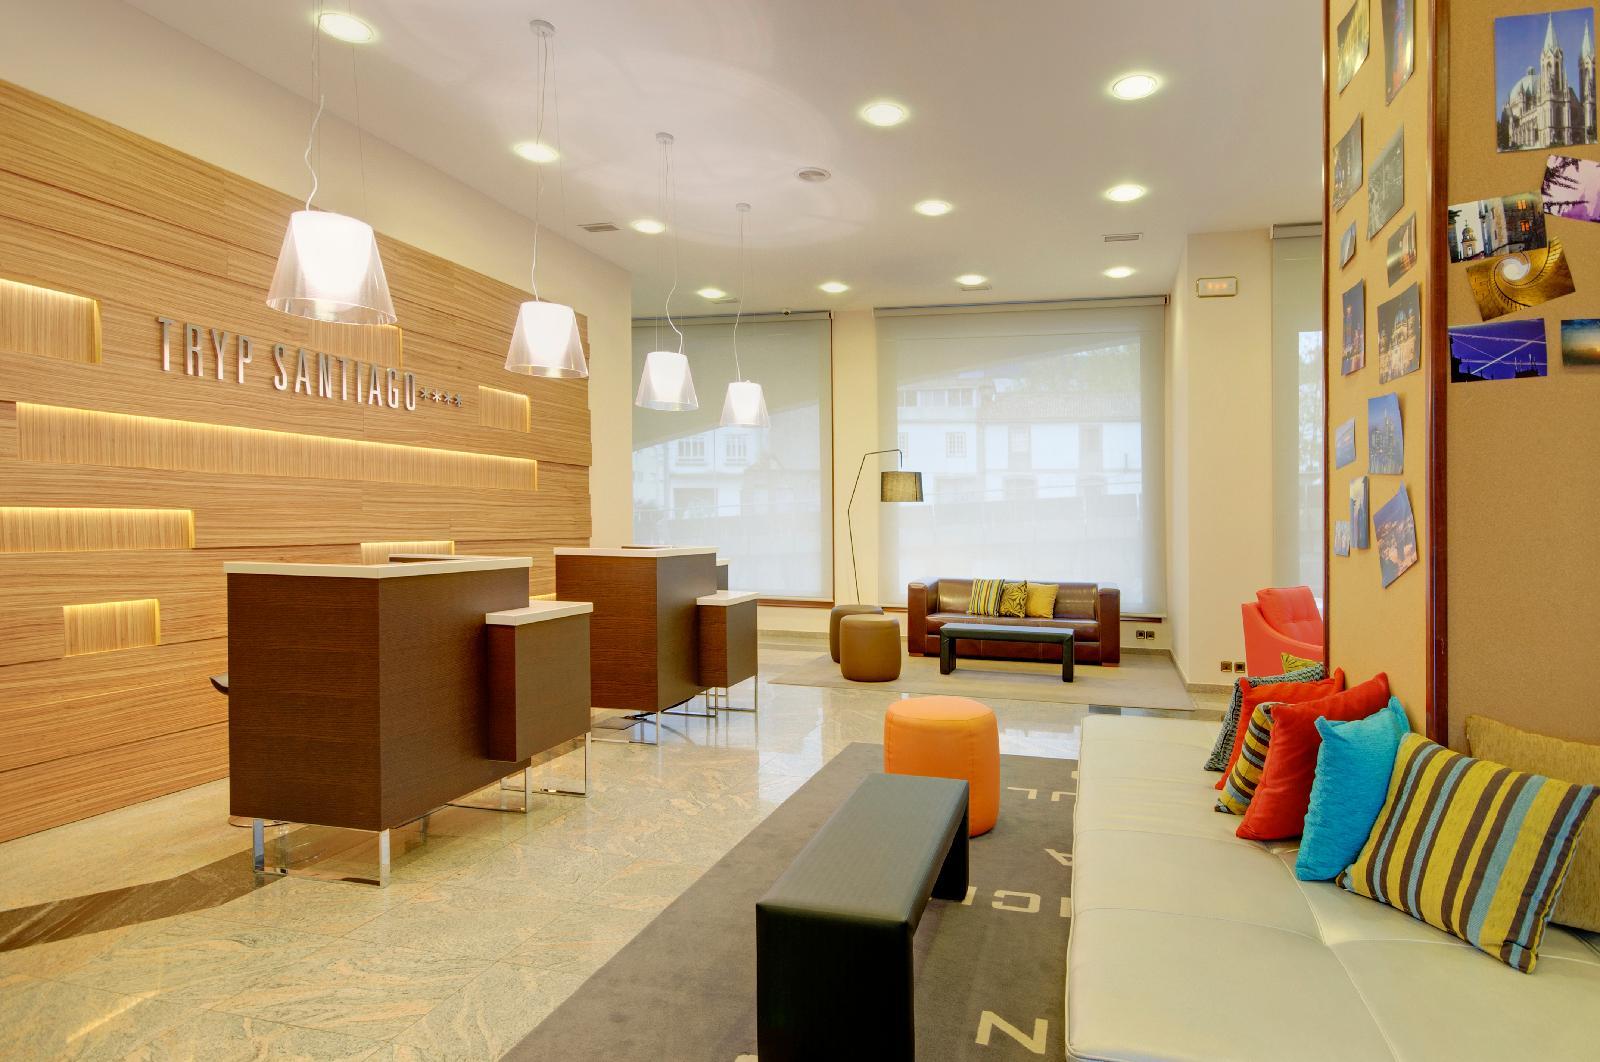 1. Tryp Santiago Hotel